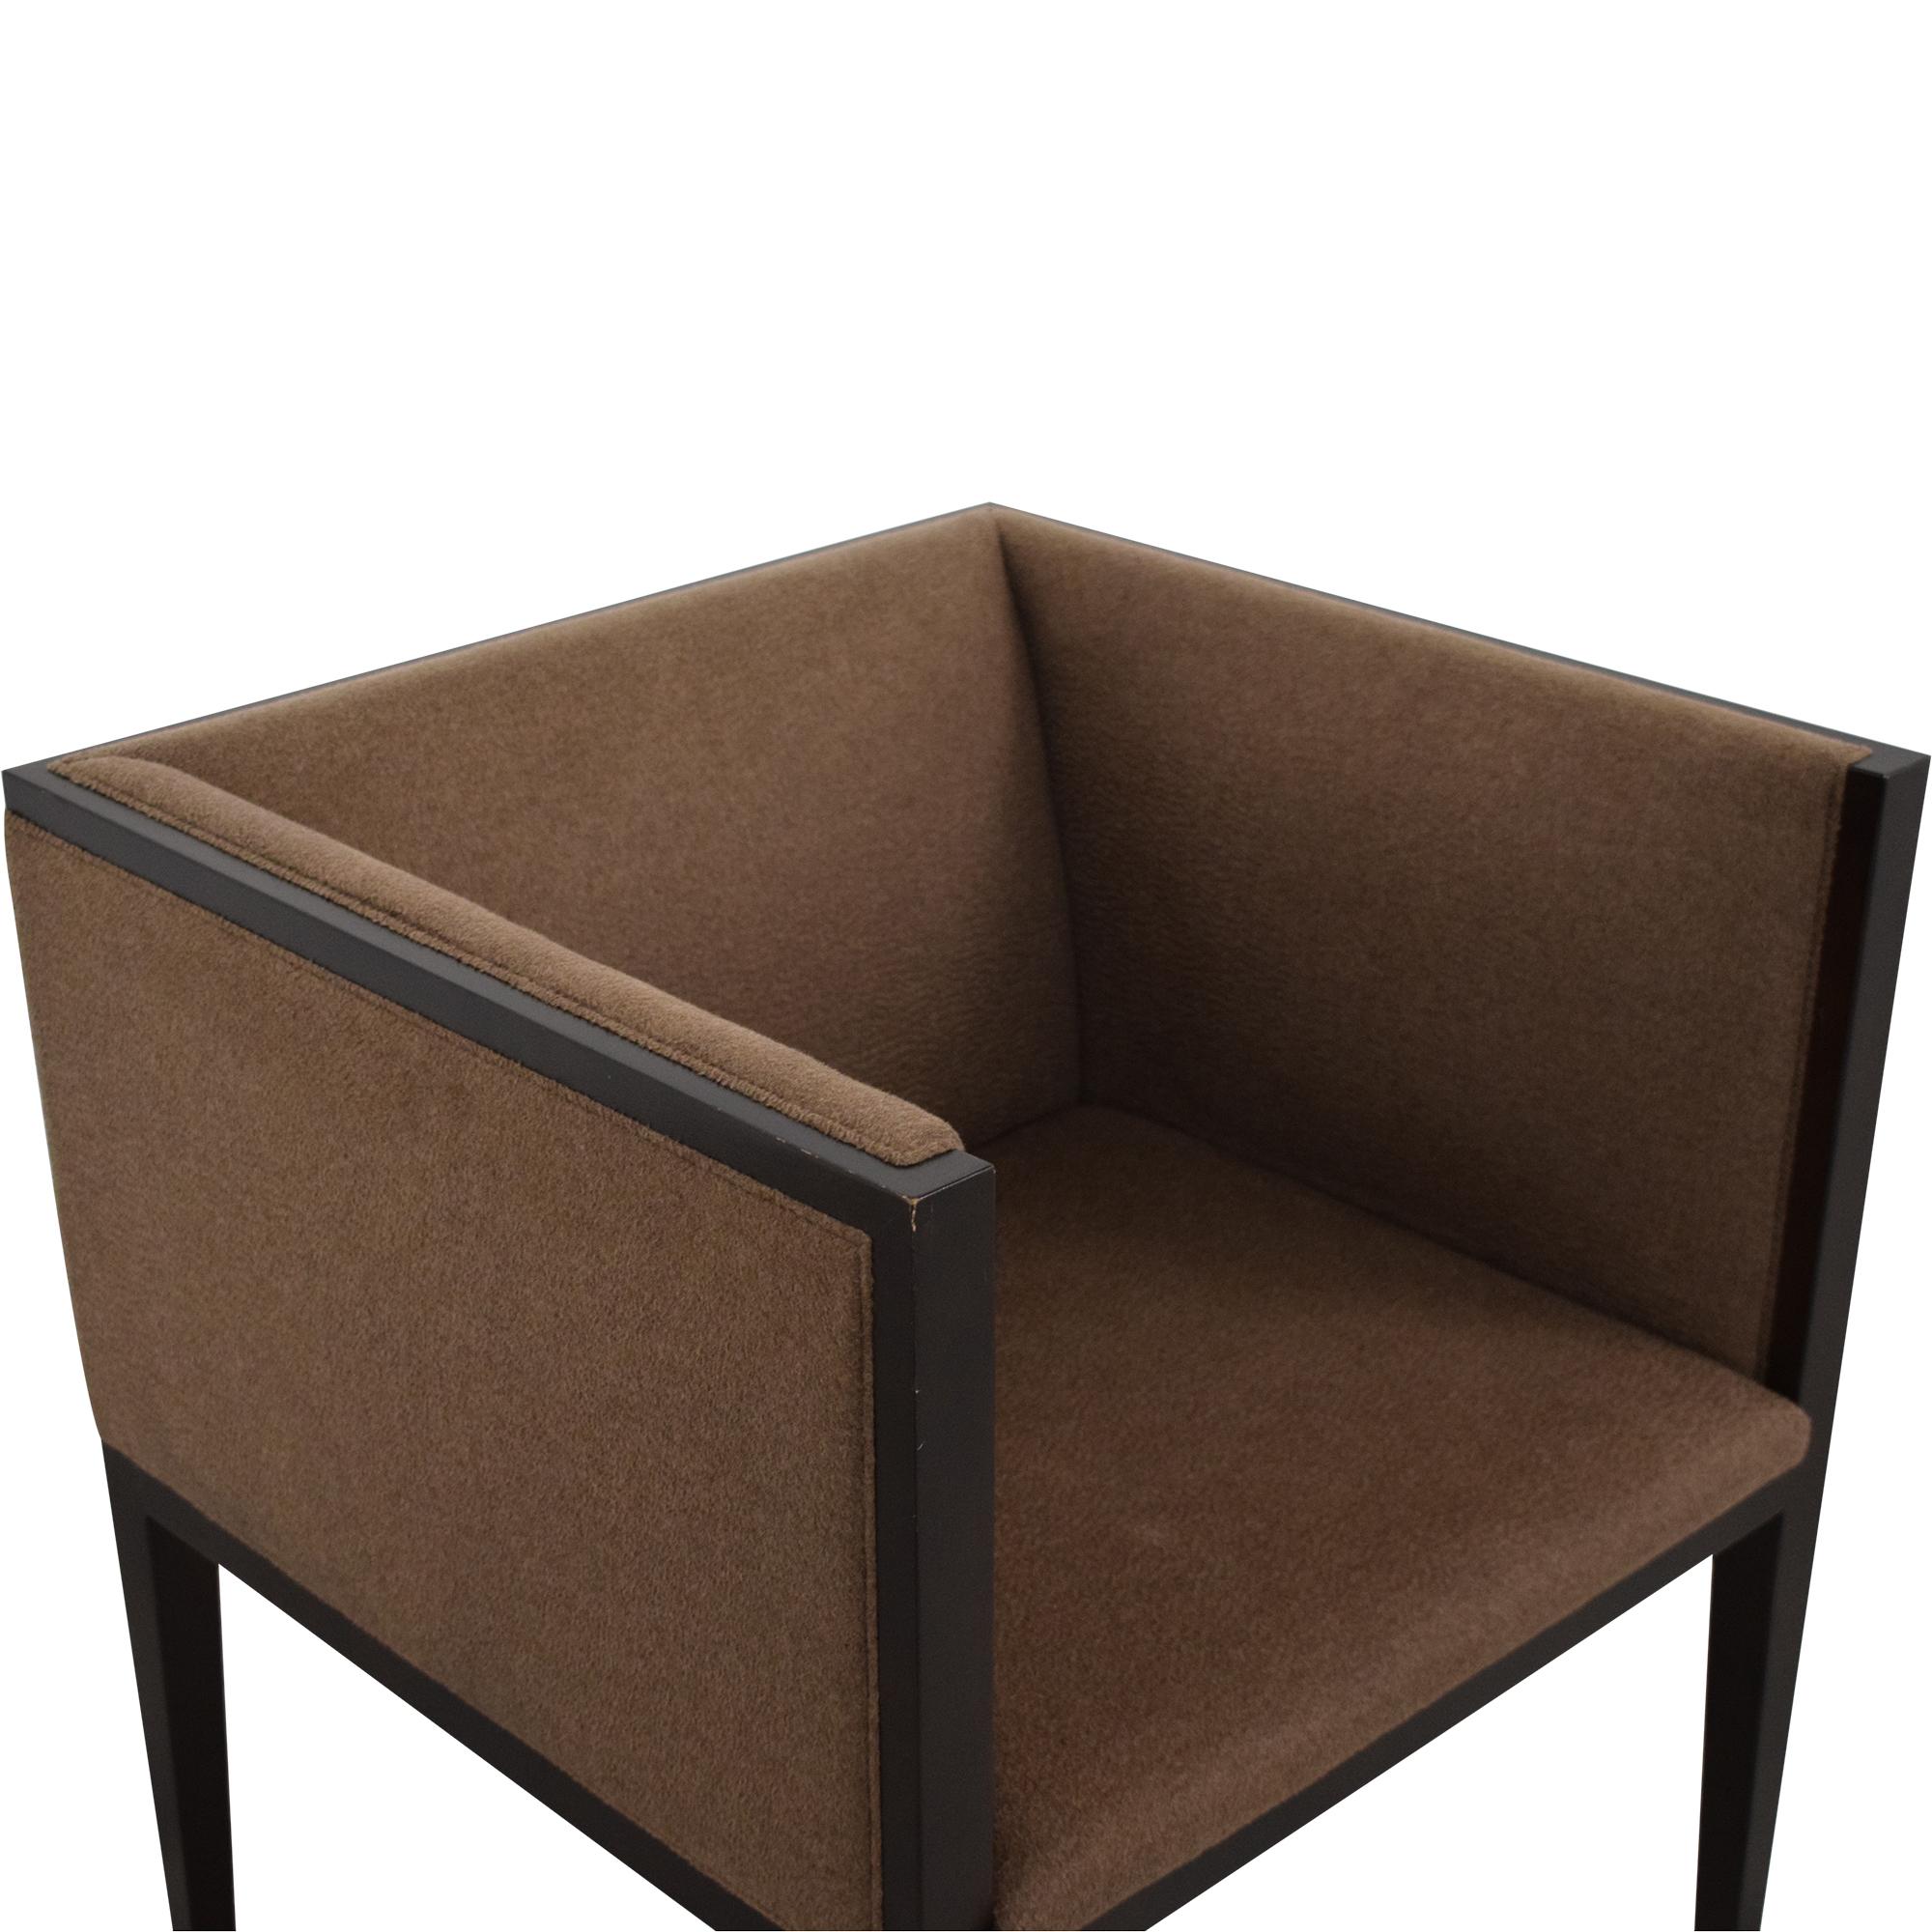 Hudson Furniture & Bedding Hudson Furniture & Bedding Tuxedo Accent Chair